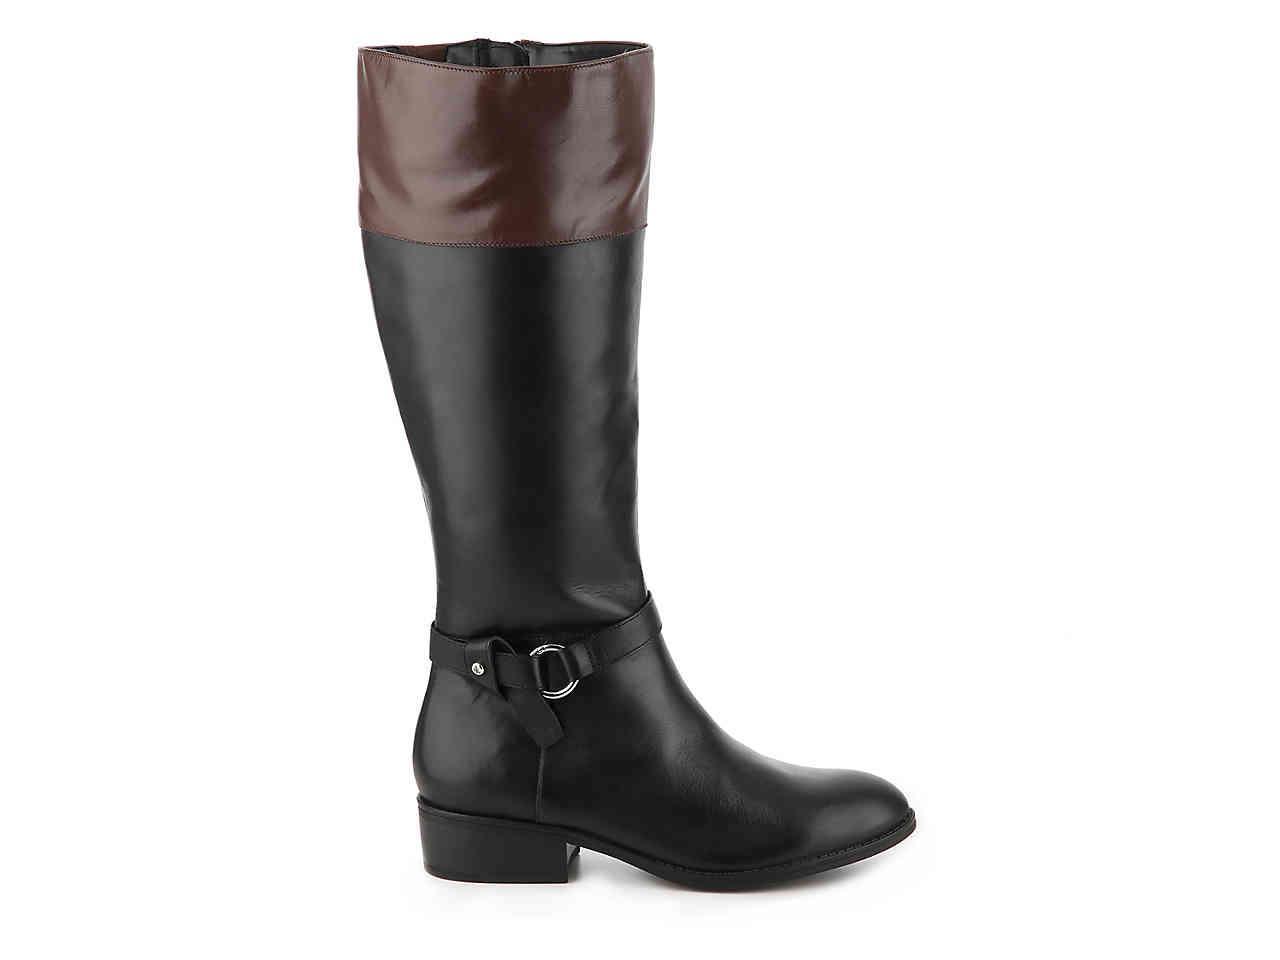 Makaila Wide Calf Riding Boot